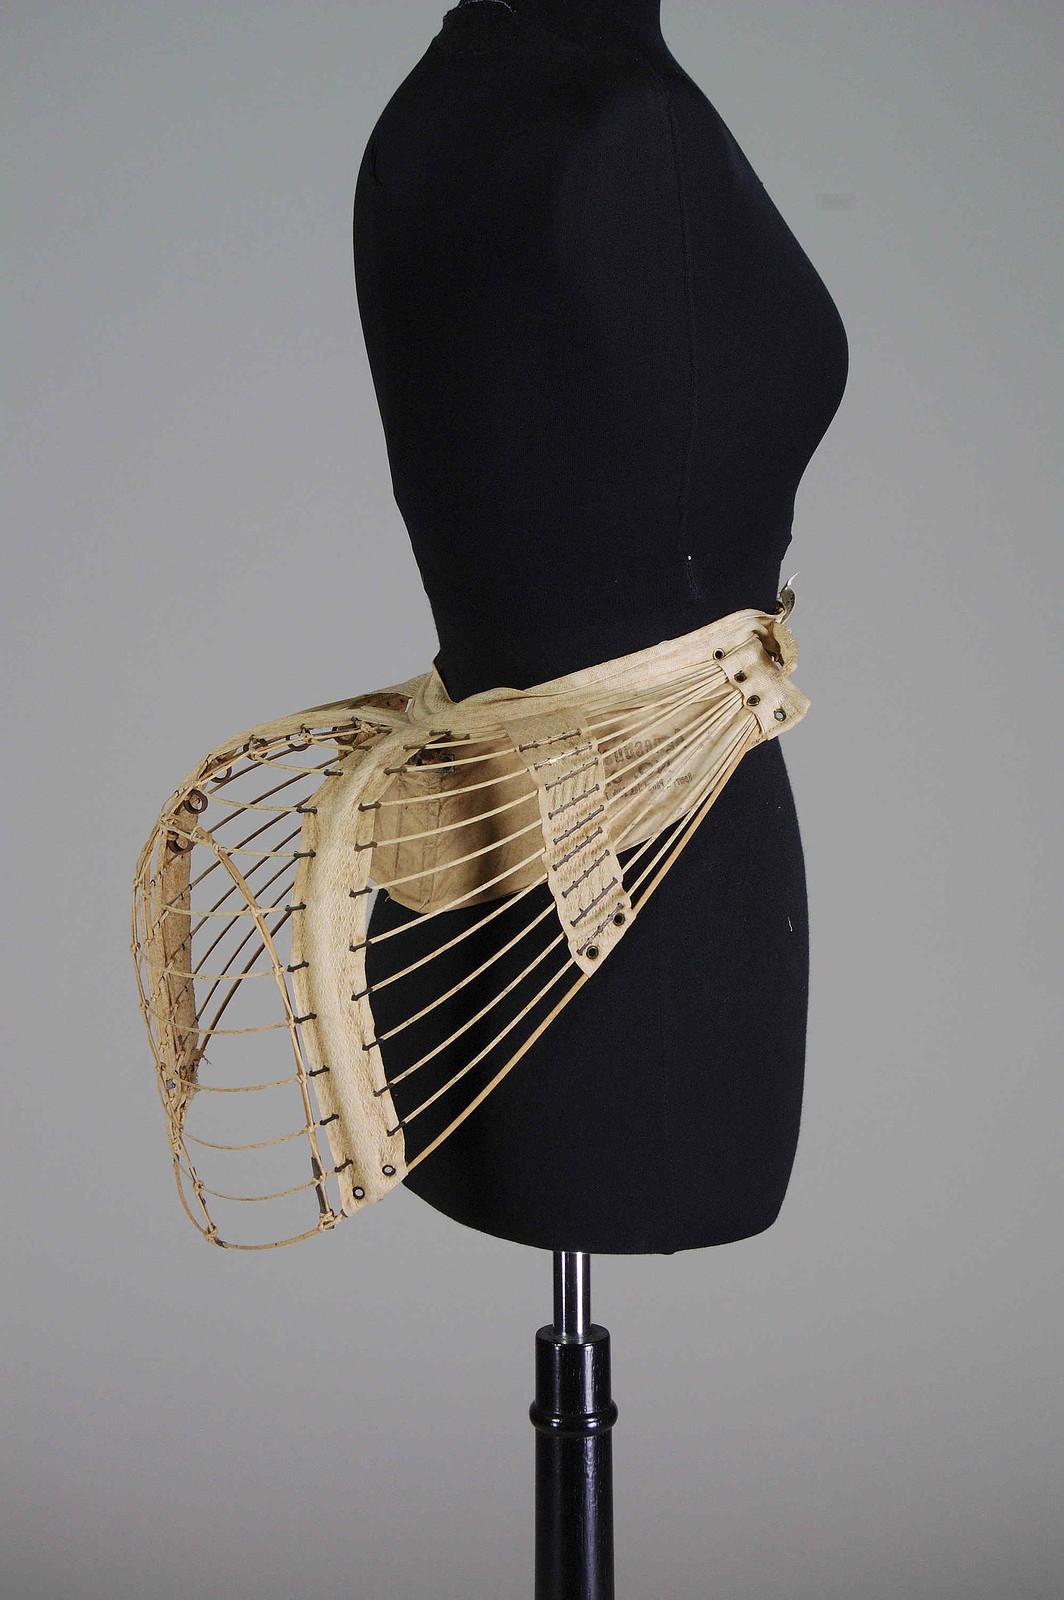 1878. American. Linen, metal. metmuseum